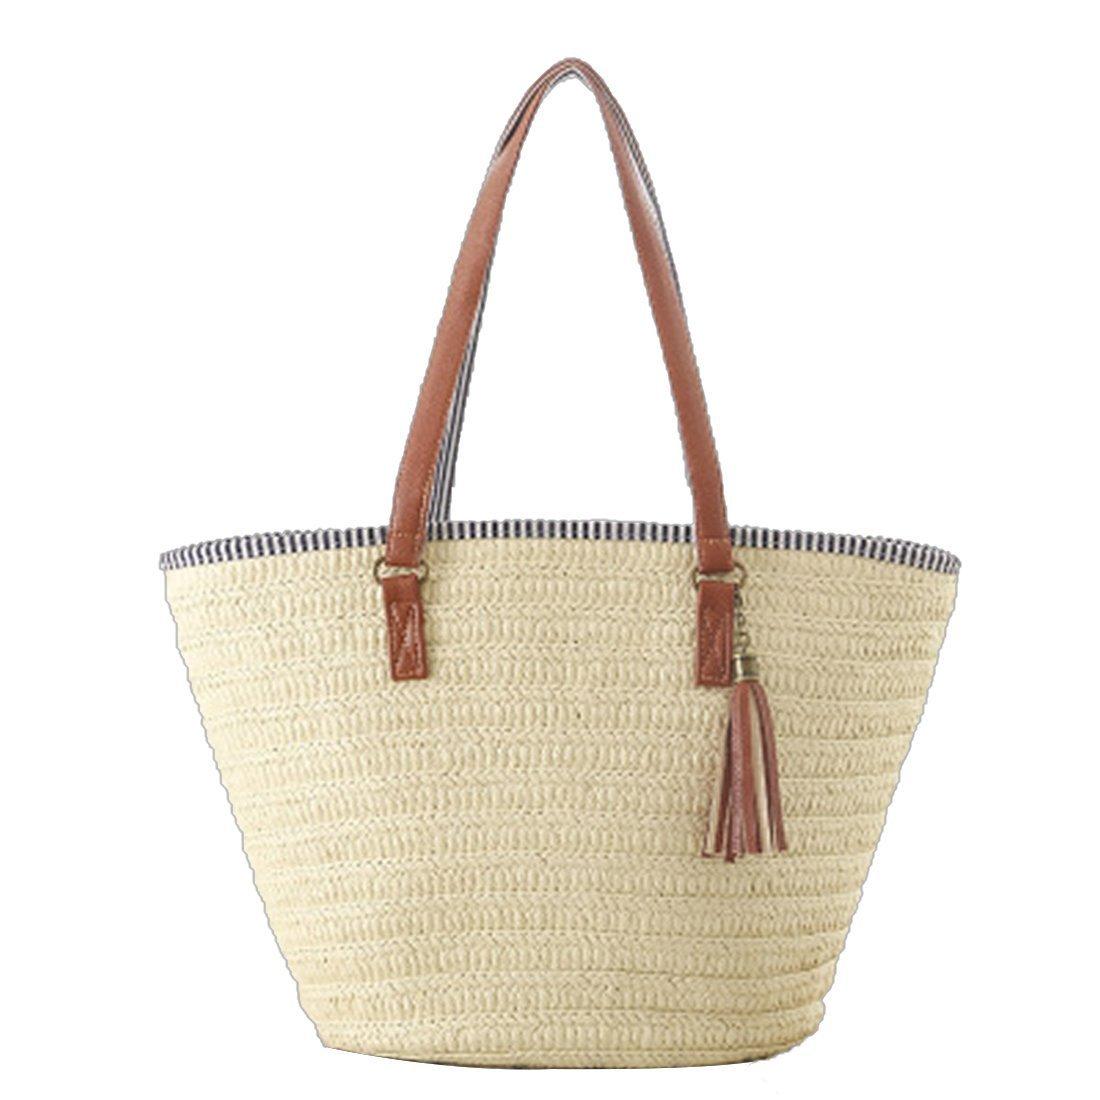 EROUGE Handmade Straw Bag Retro Woven Shoulder Bag Women Tassels Bag Large Hobo Beach Bag (Beige)